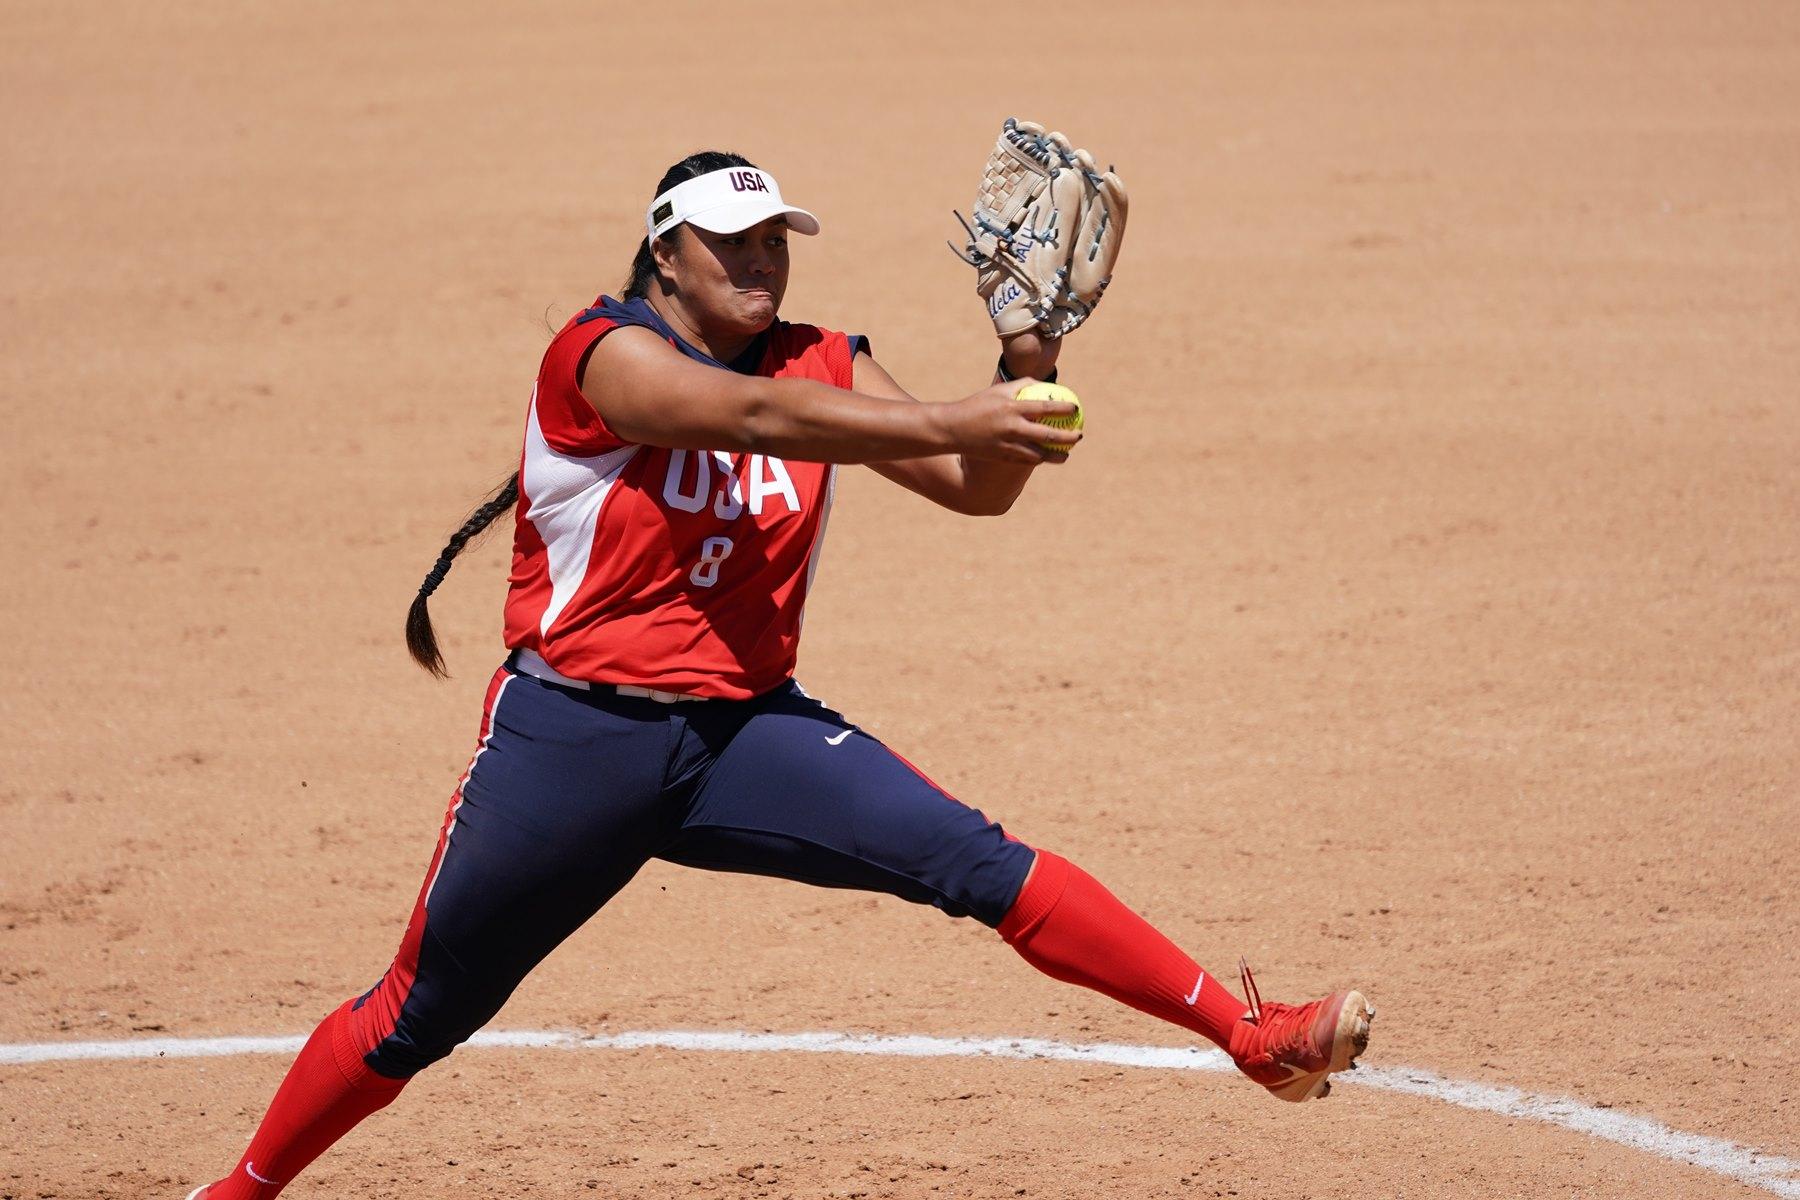 USA starter Megan Faraimo